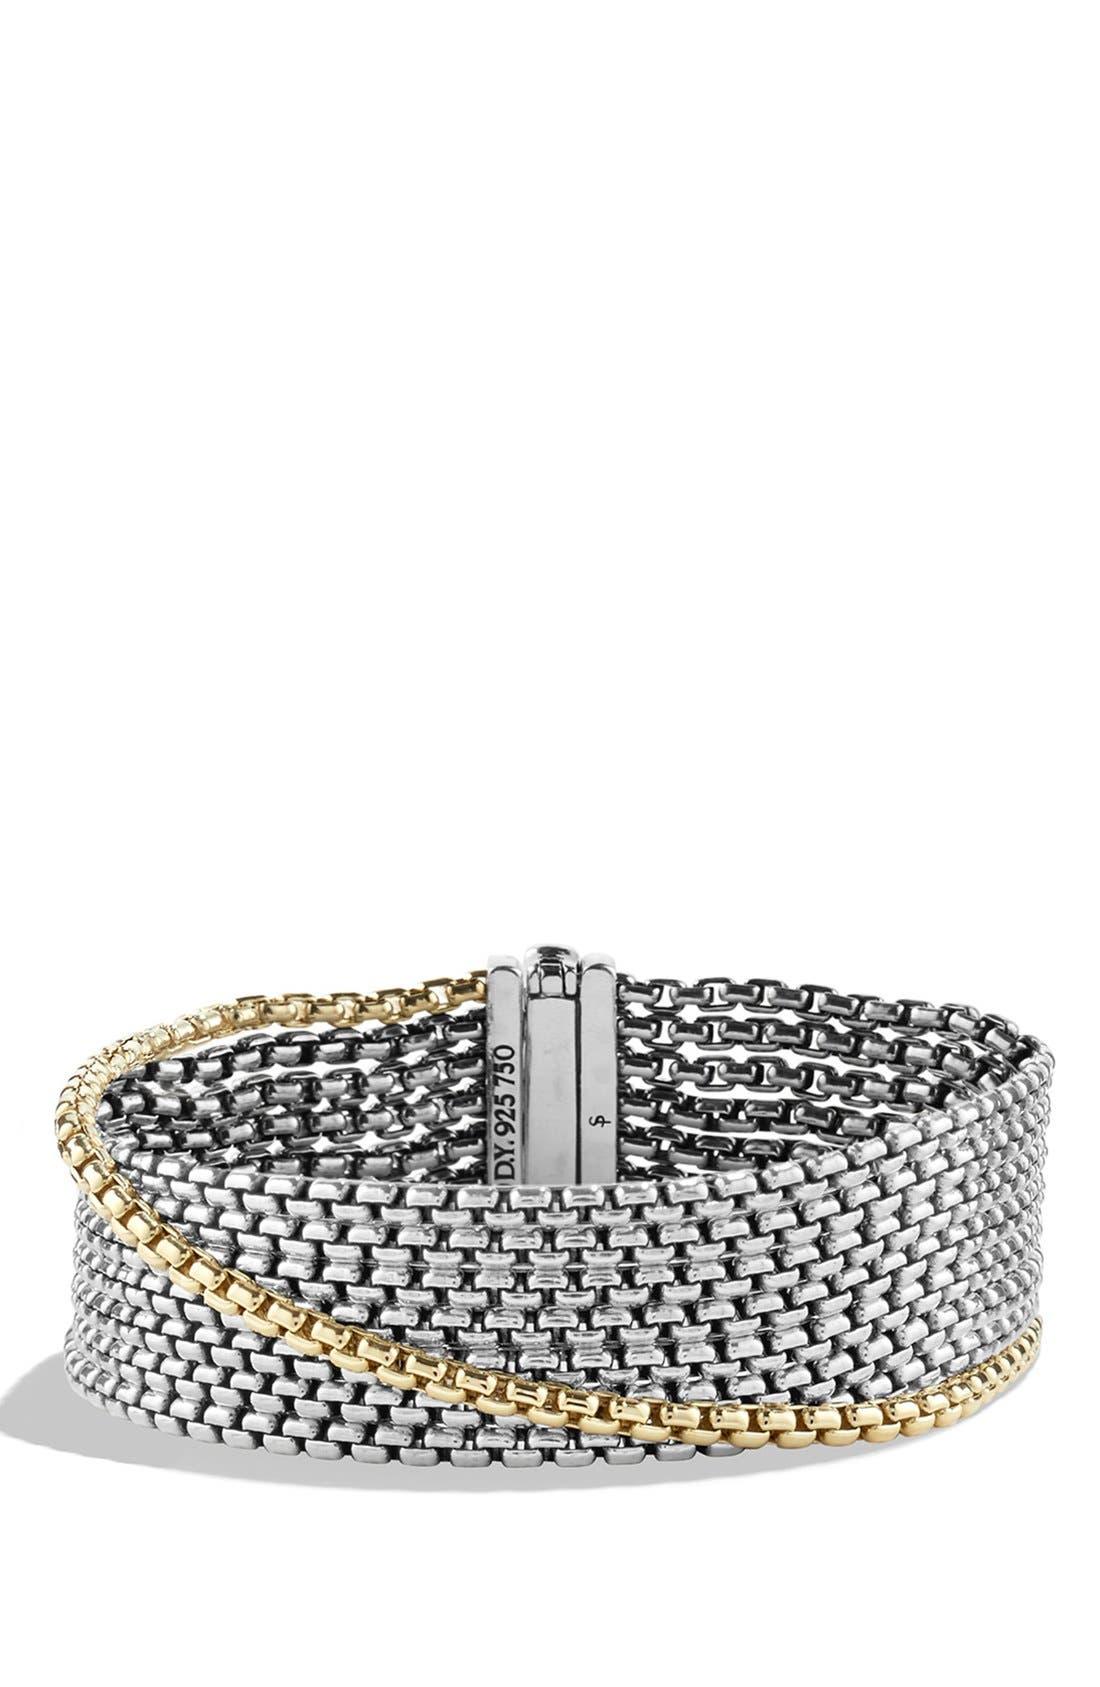 DAVID YURMAN 'Chain' Box Chain Eight-Row Bracelet with